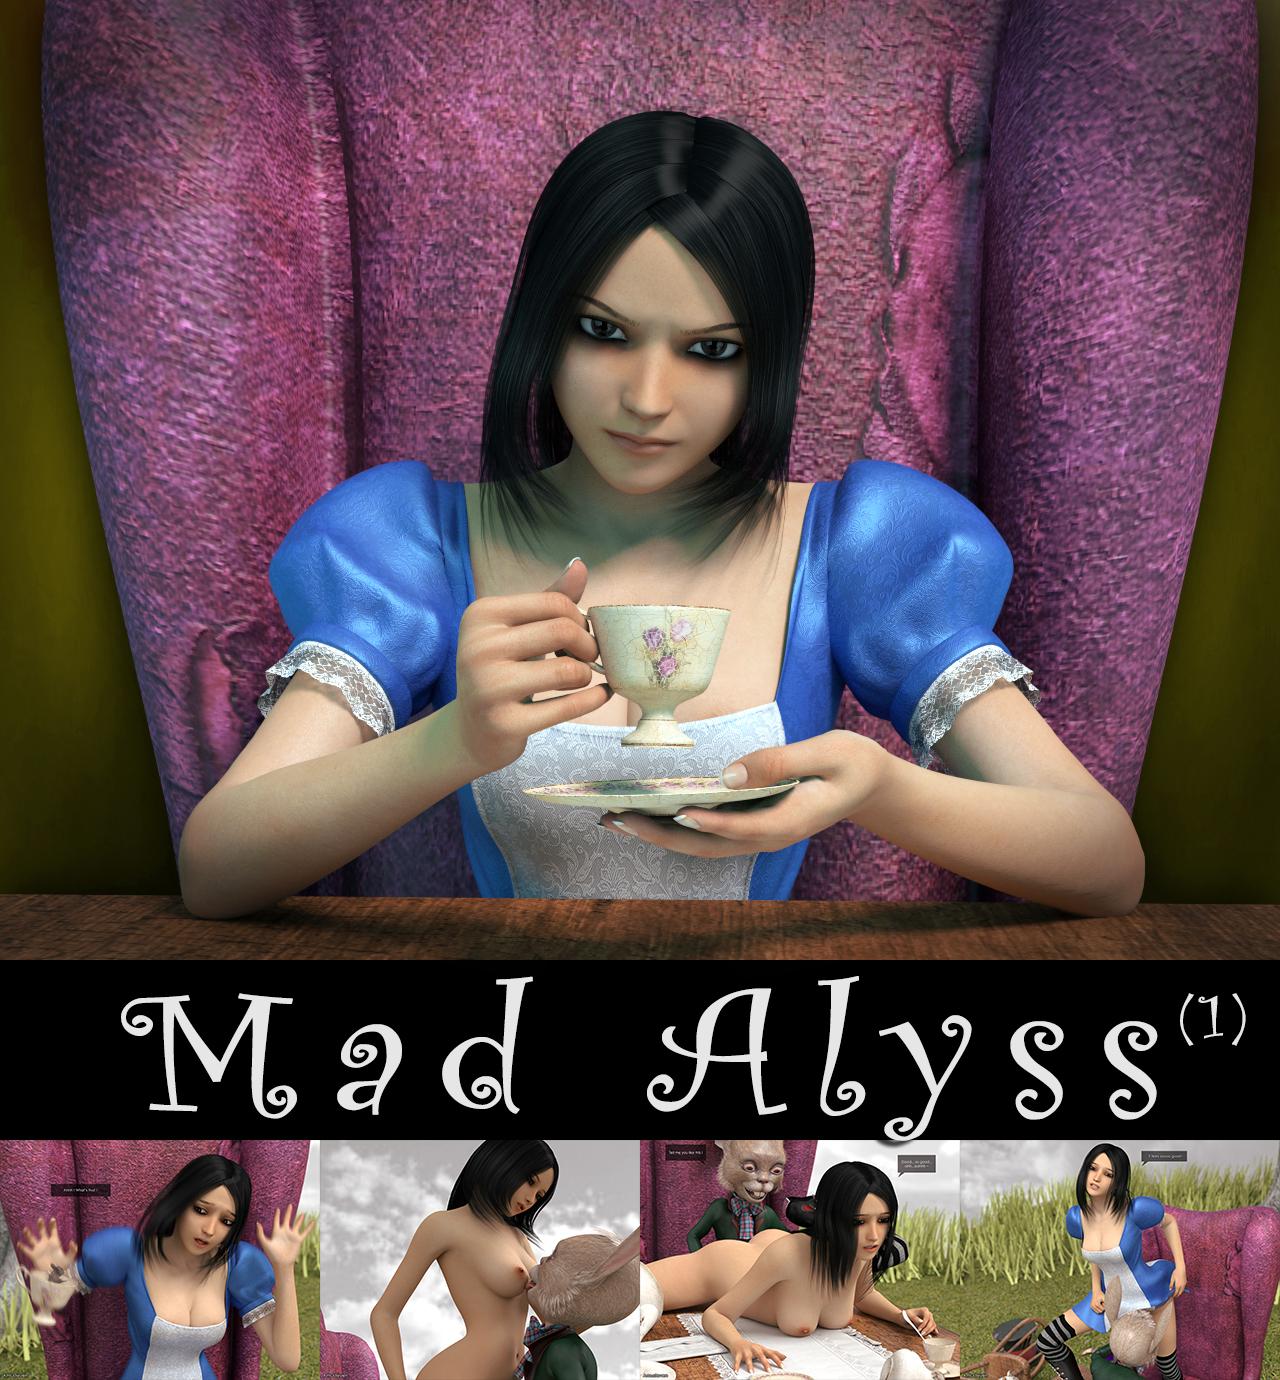 SureFap xxx porno Alice in Wonderland - [Amusteven] - Mad Alyss